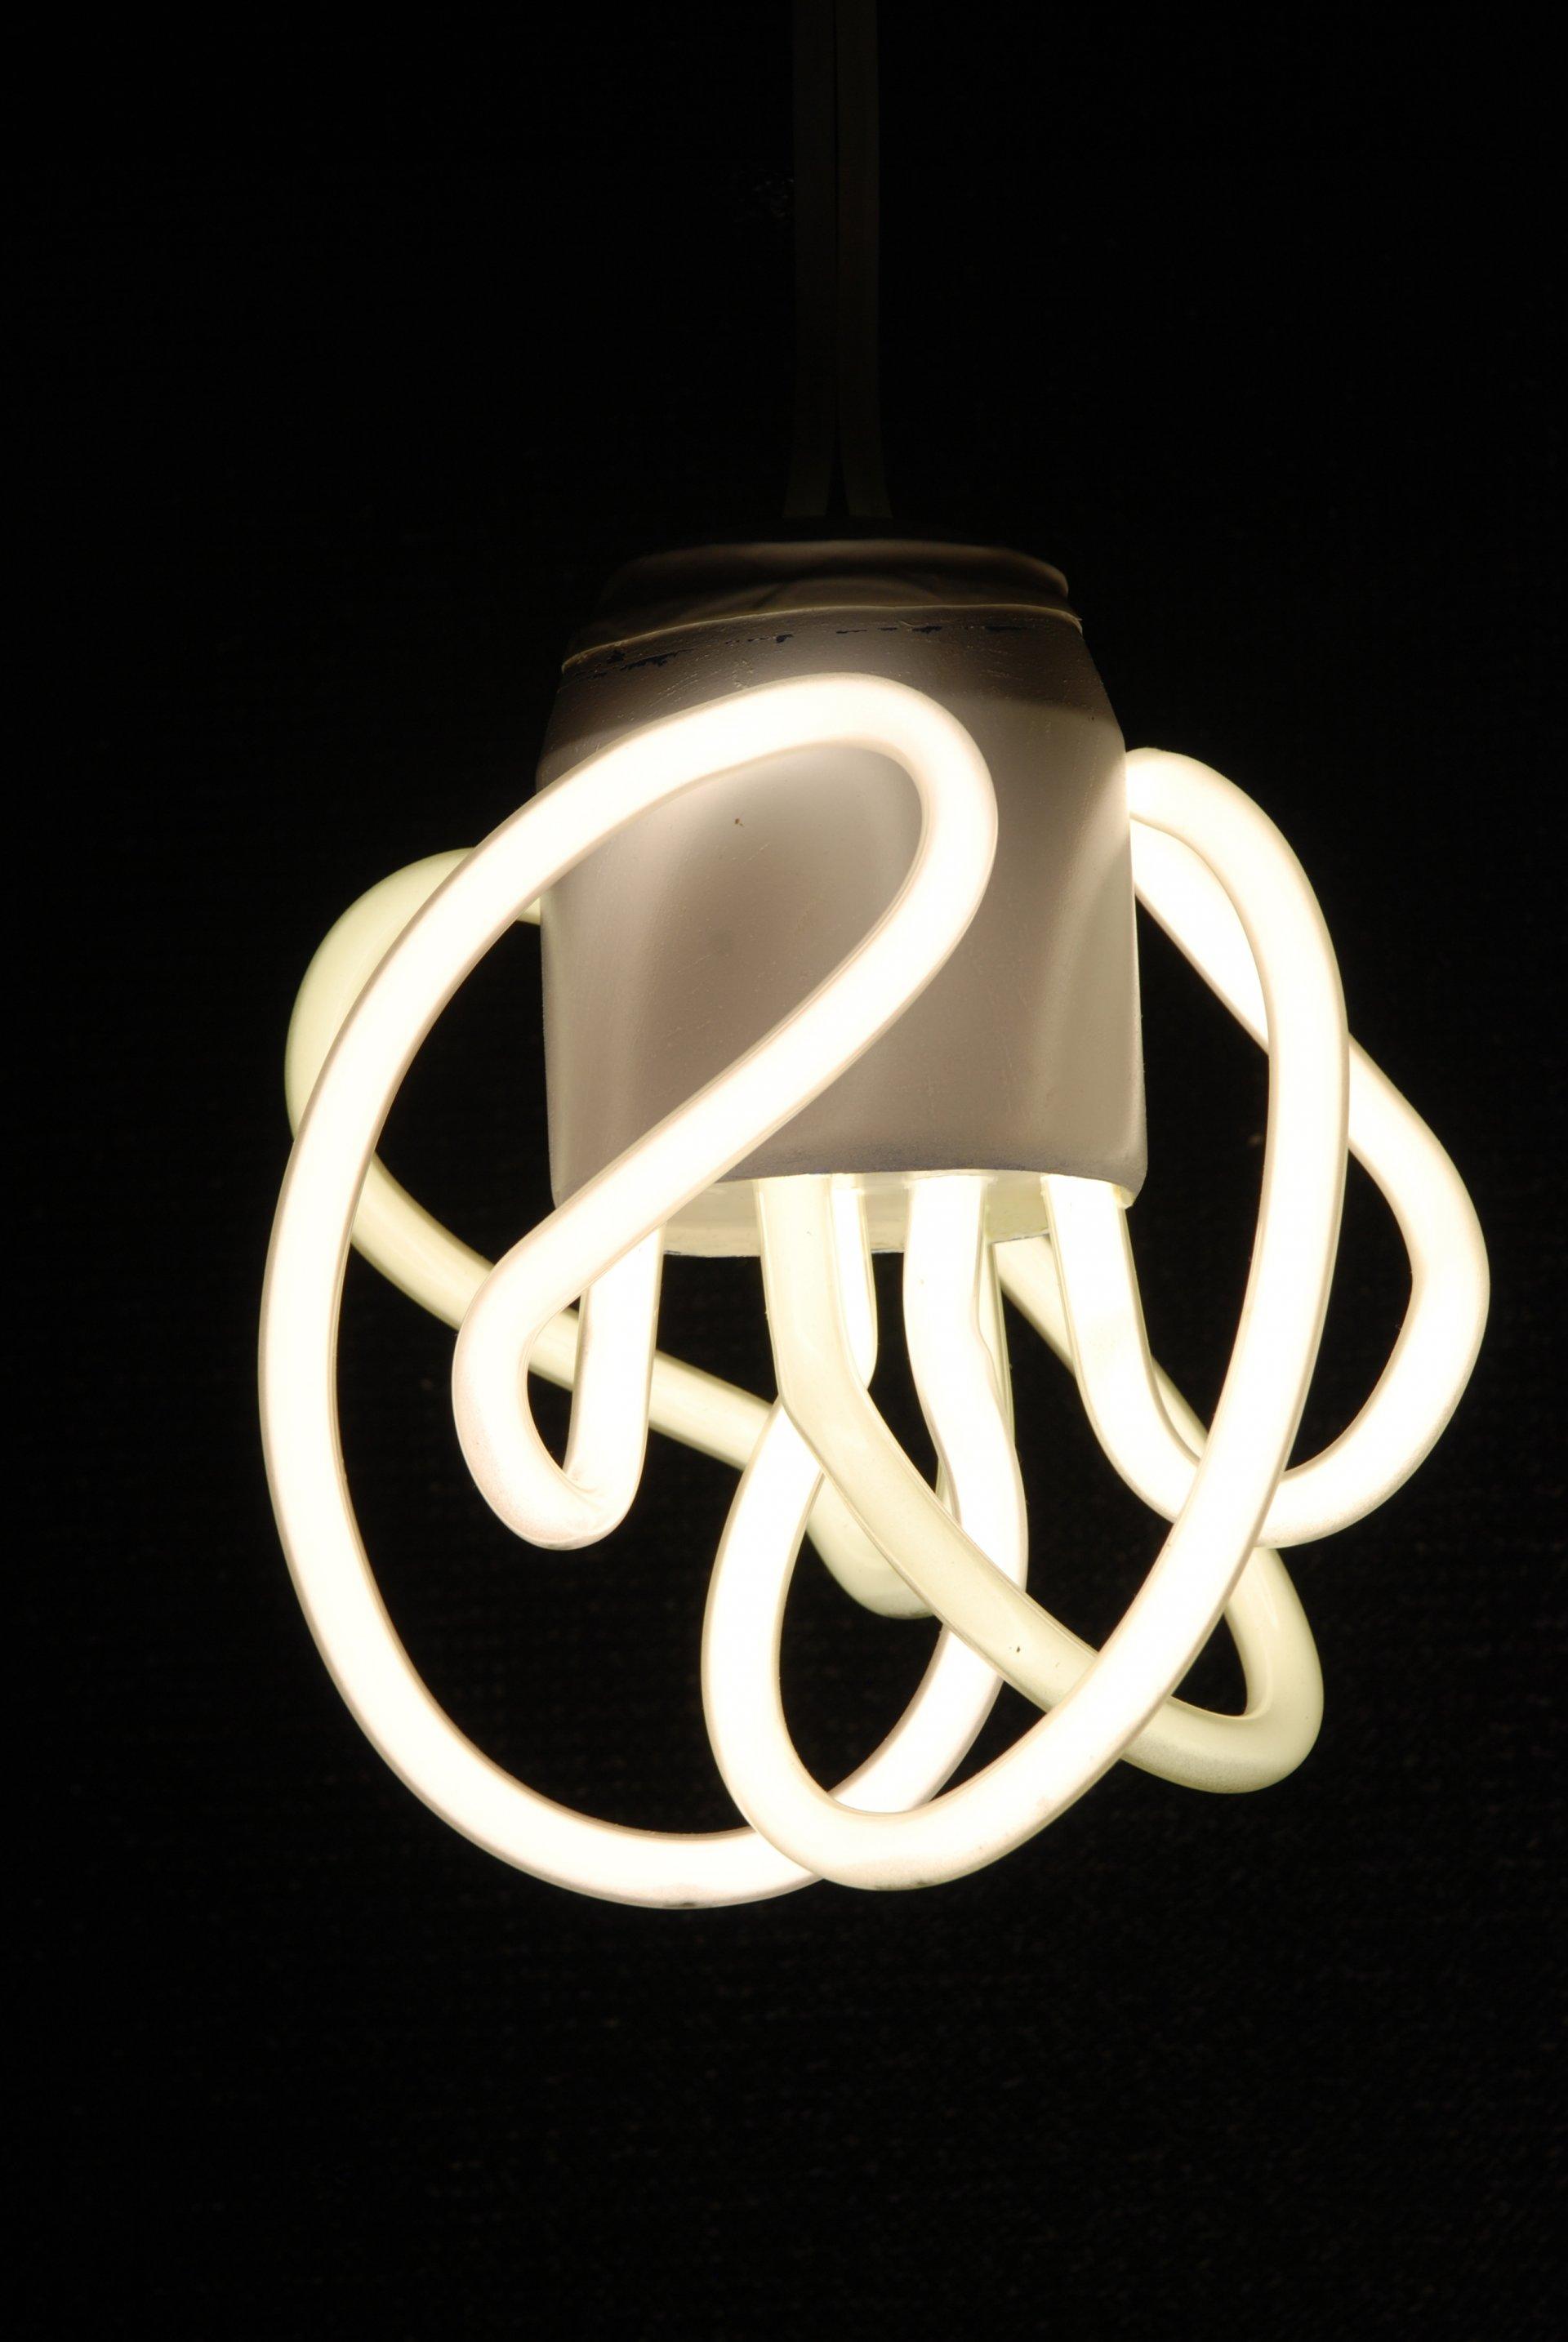 plumen-prototype-1 Prototypes (3 different neons) Hulger